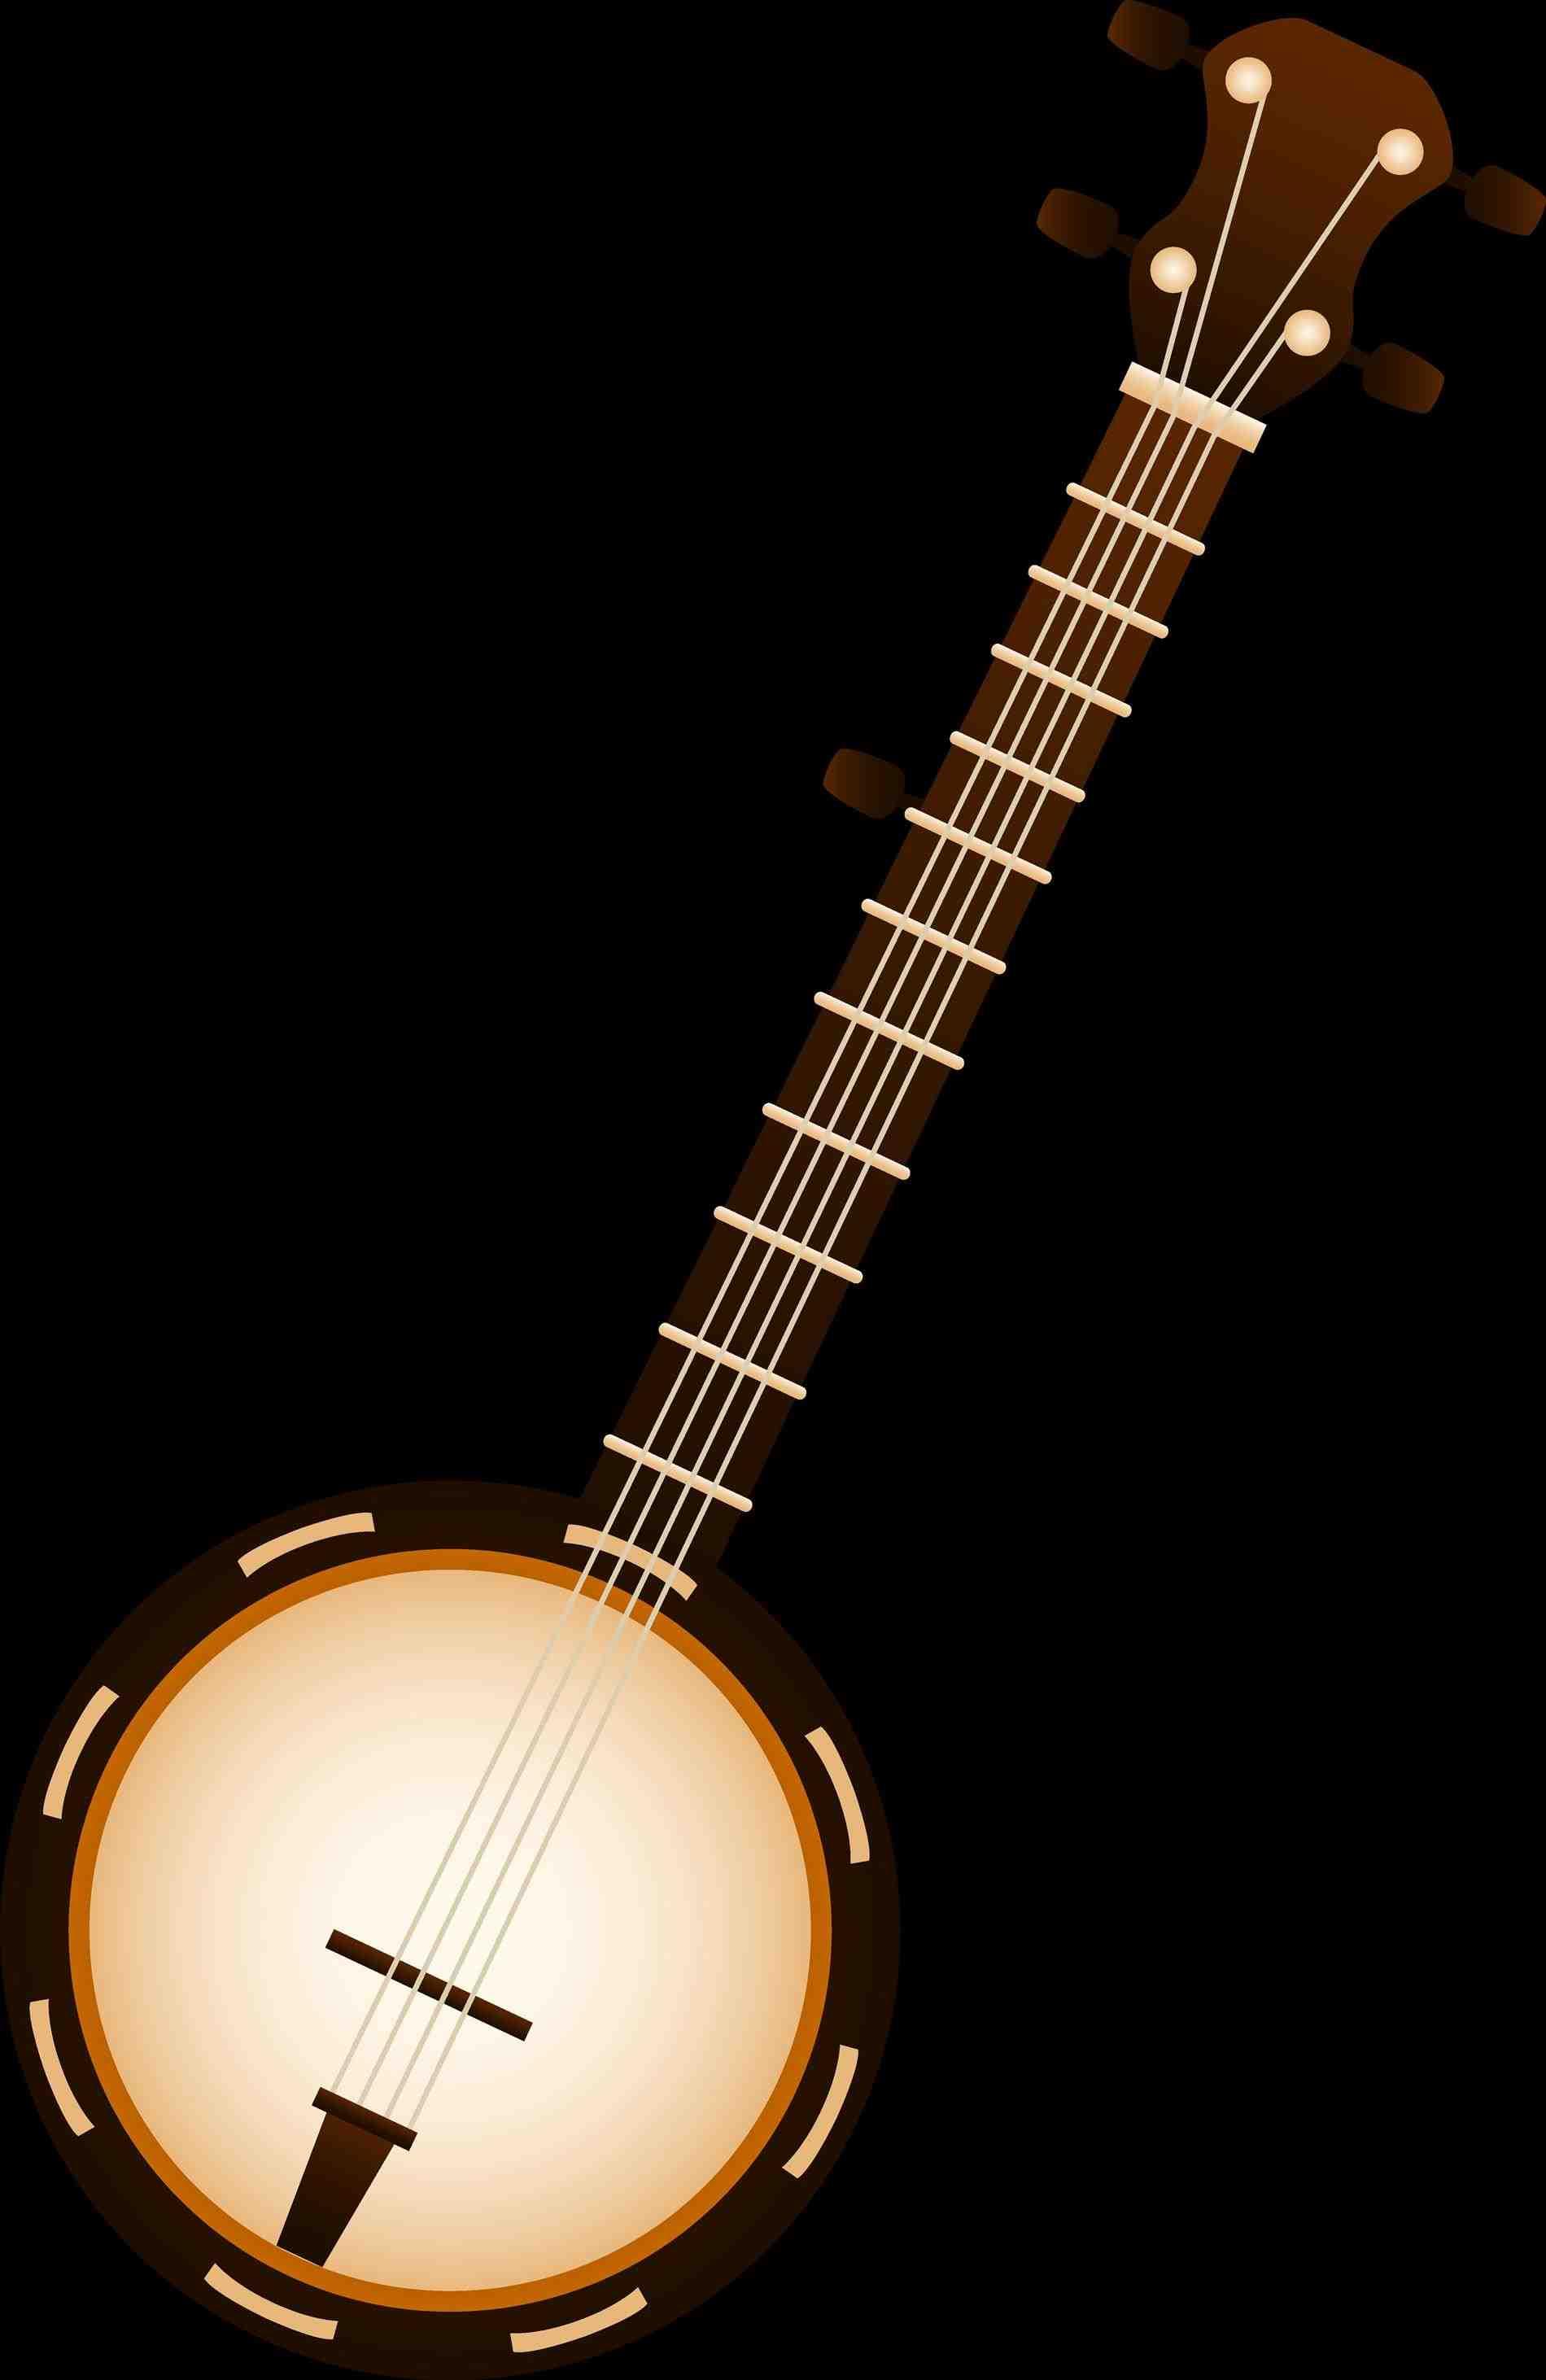 Free clip art sweet. Banjo clipart musical instrument